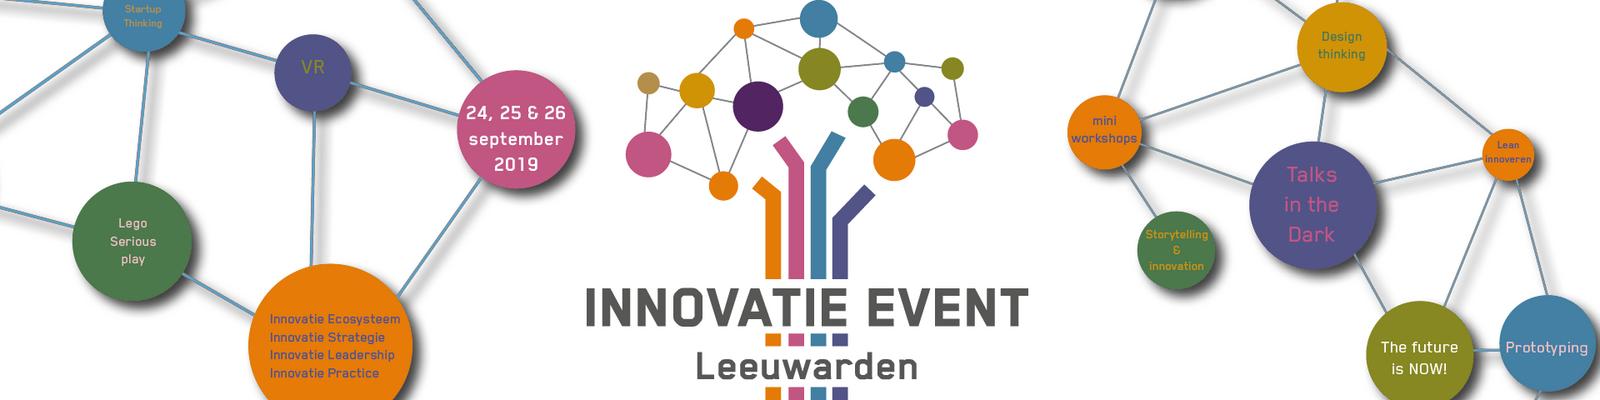 Innovatie Event Leeuwarden